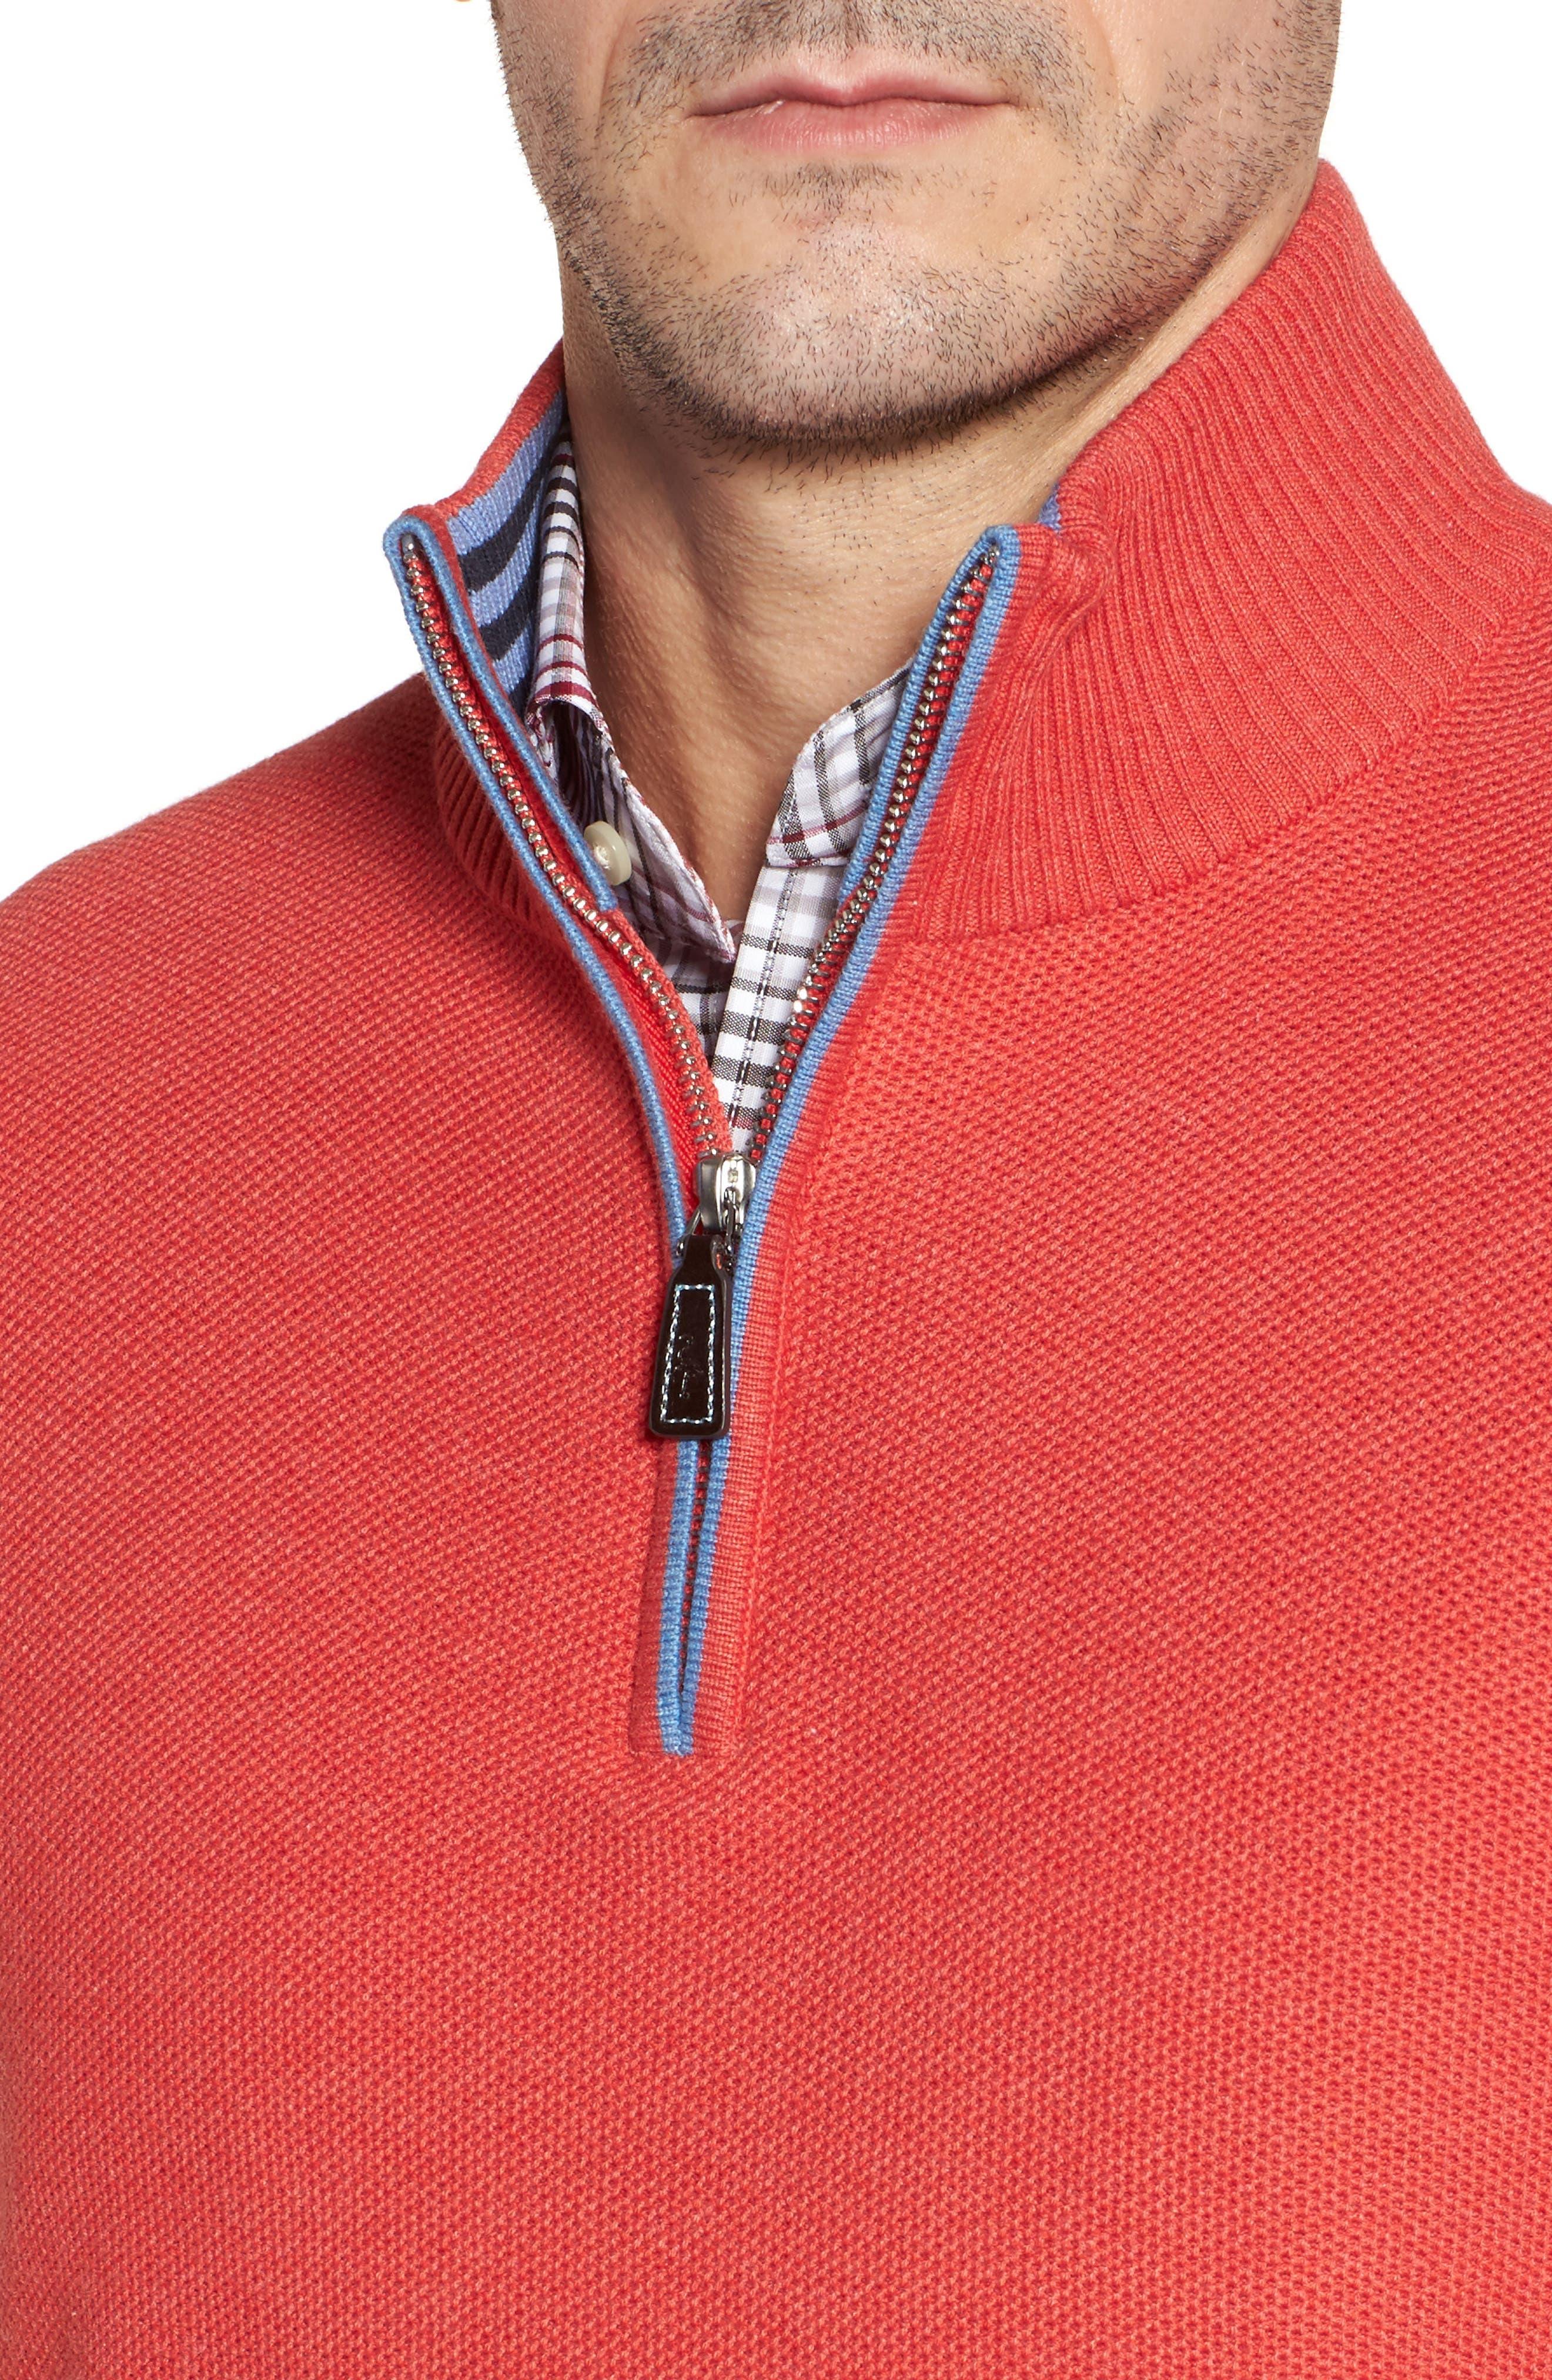 Sorrel Tipped Quarter Zip Sweater,                             Alternate thumbnail 4, color,                             950